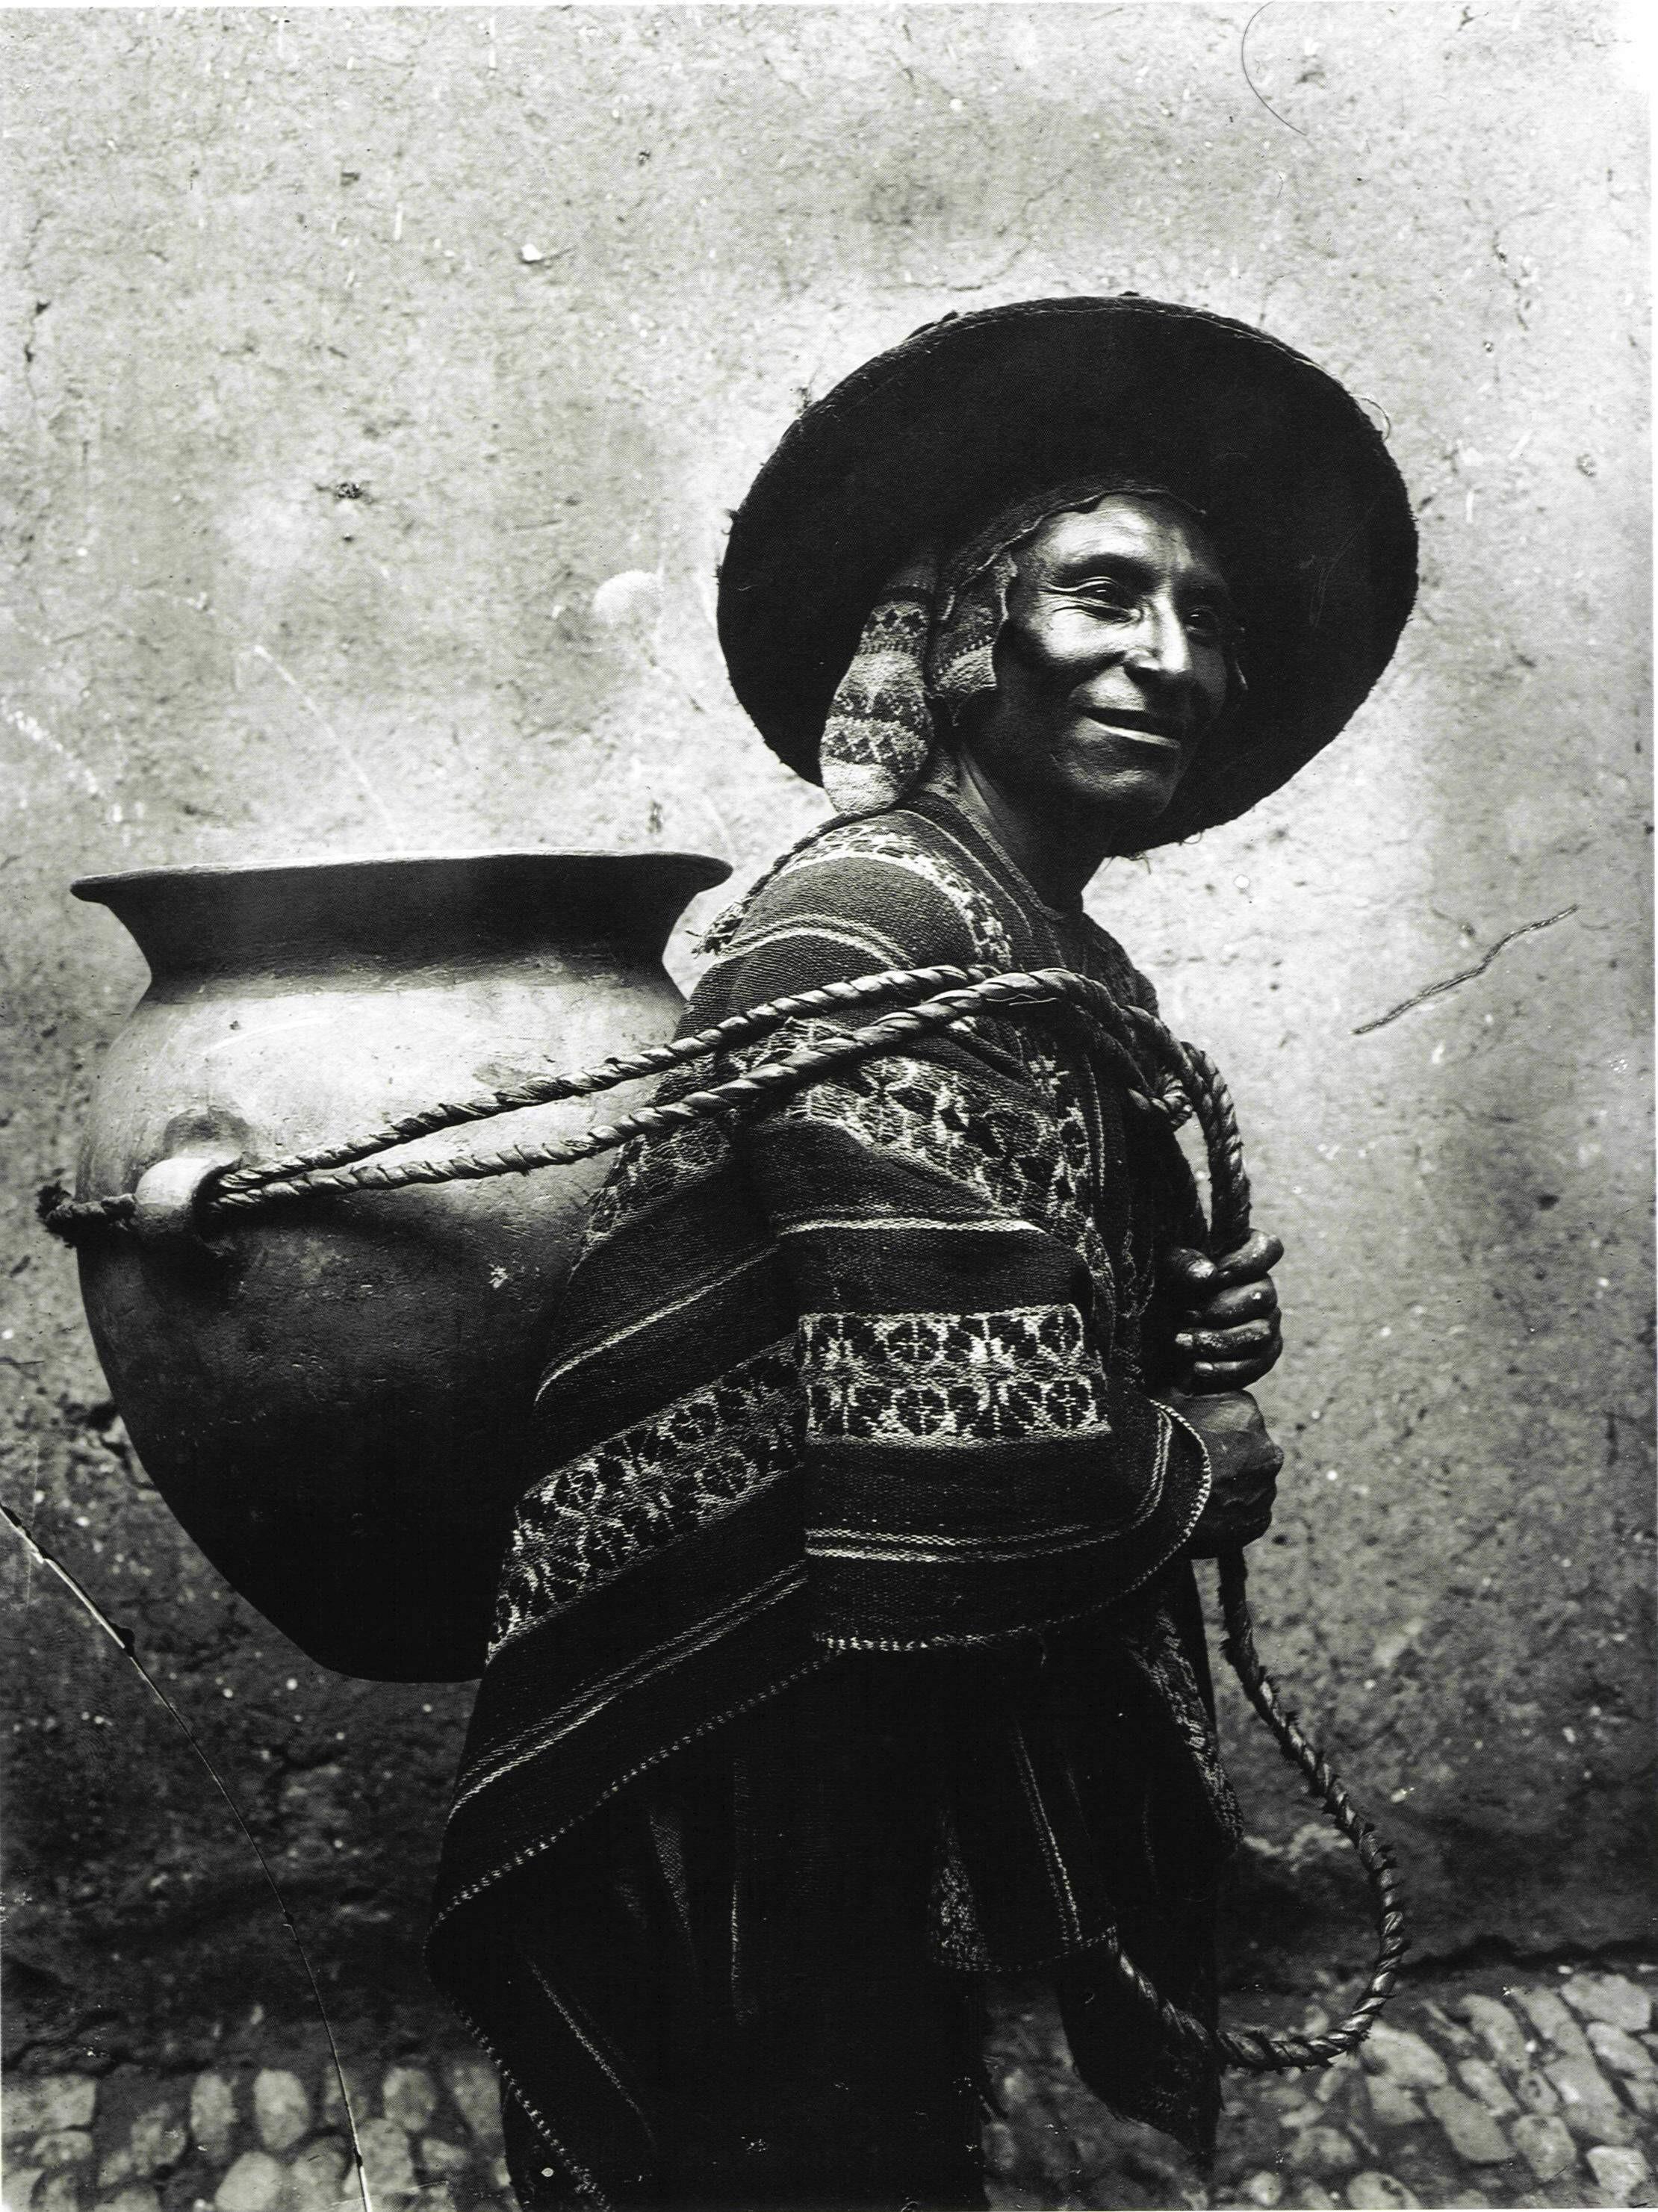 Чича (в казане), 1940. Фотограф Мартин Чамби